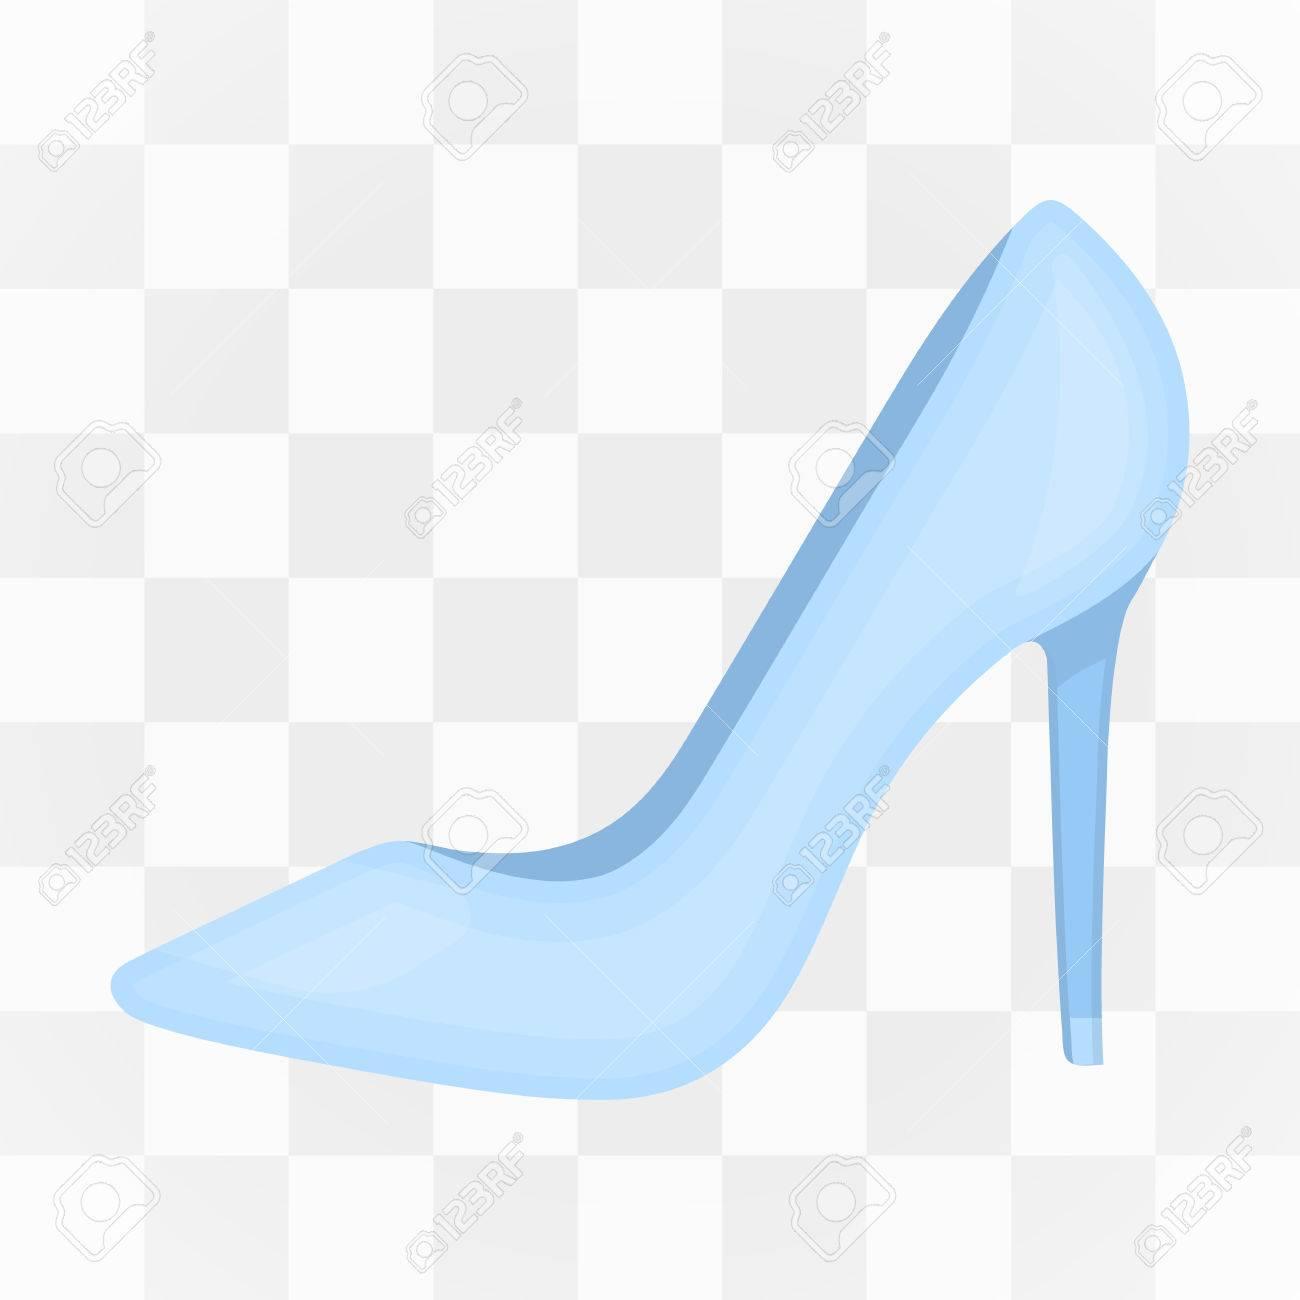 Digital Illustration Emoji Bride Shoes Bride and Groom Cartoon Shoes Caricature Wedding Shoes Custom wedding Emoji Wedding Toms